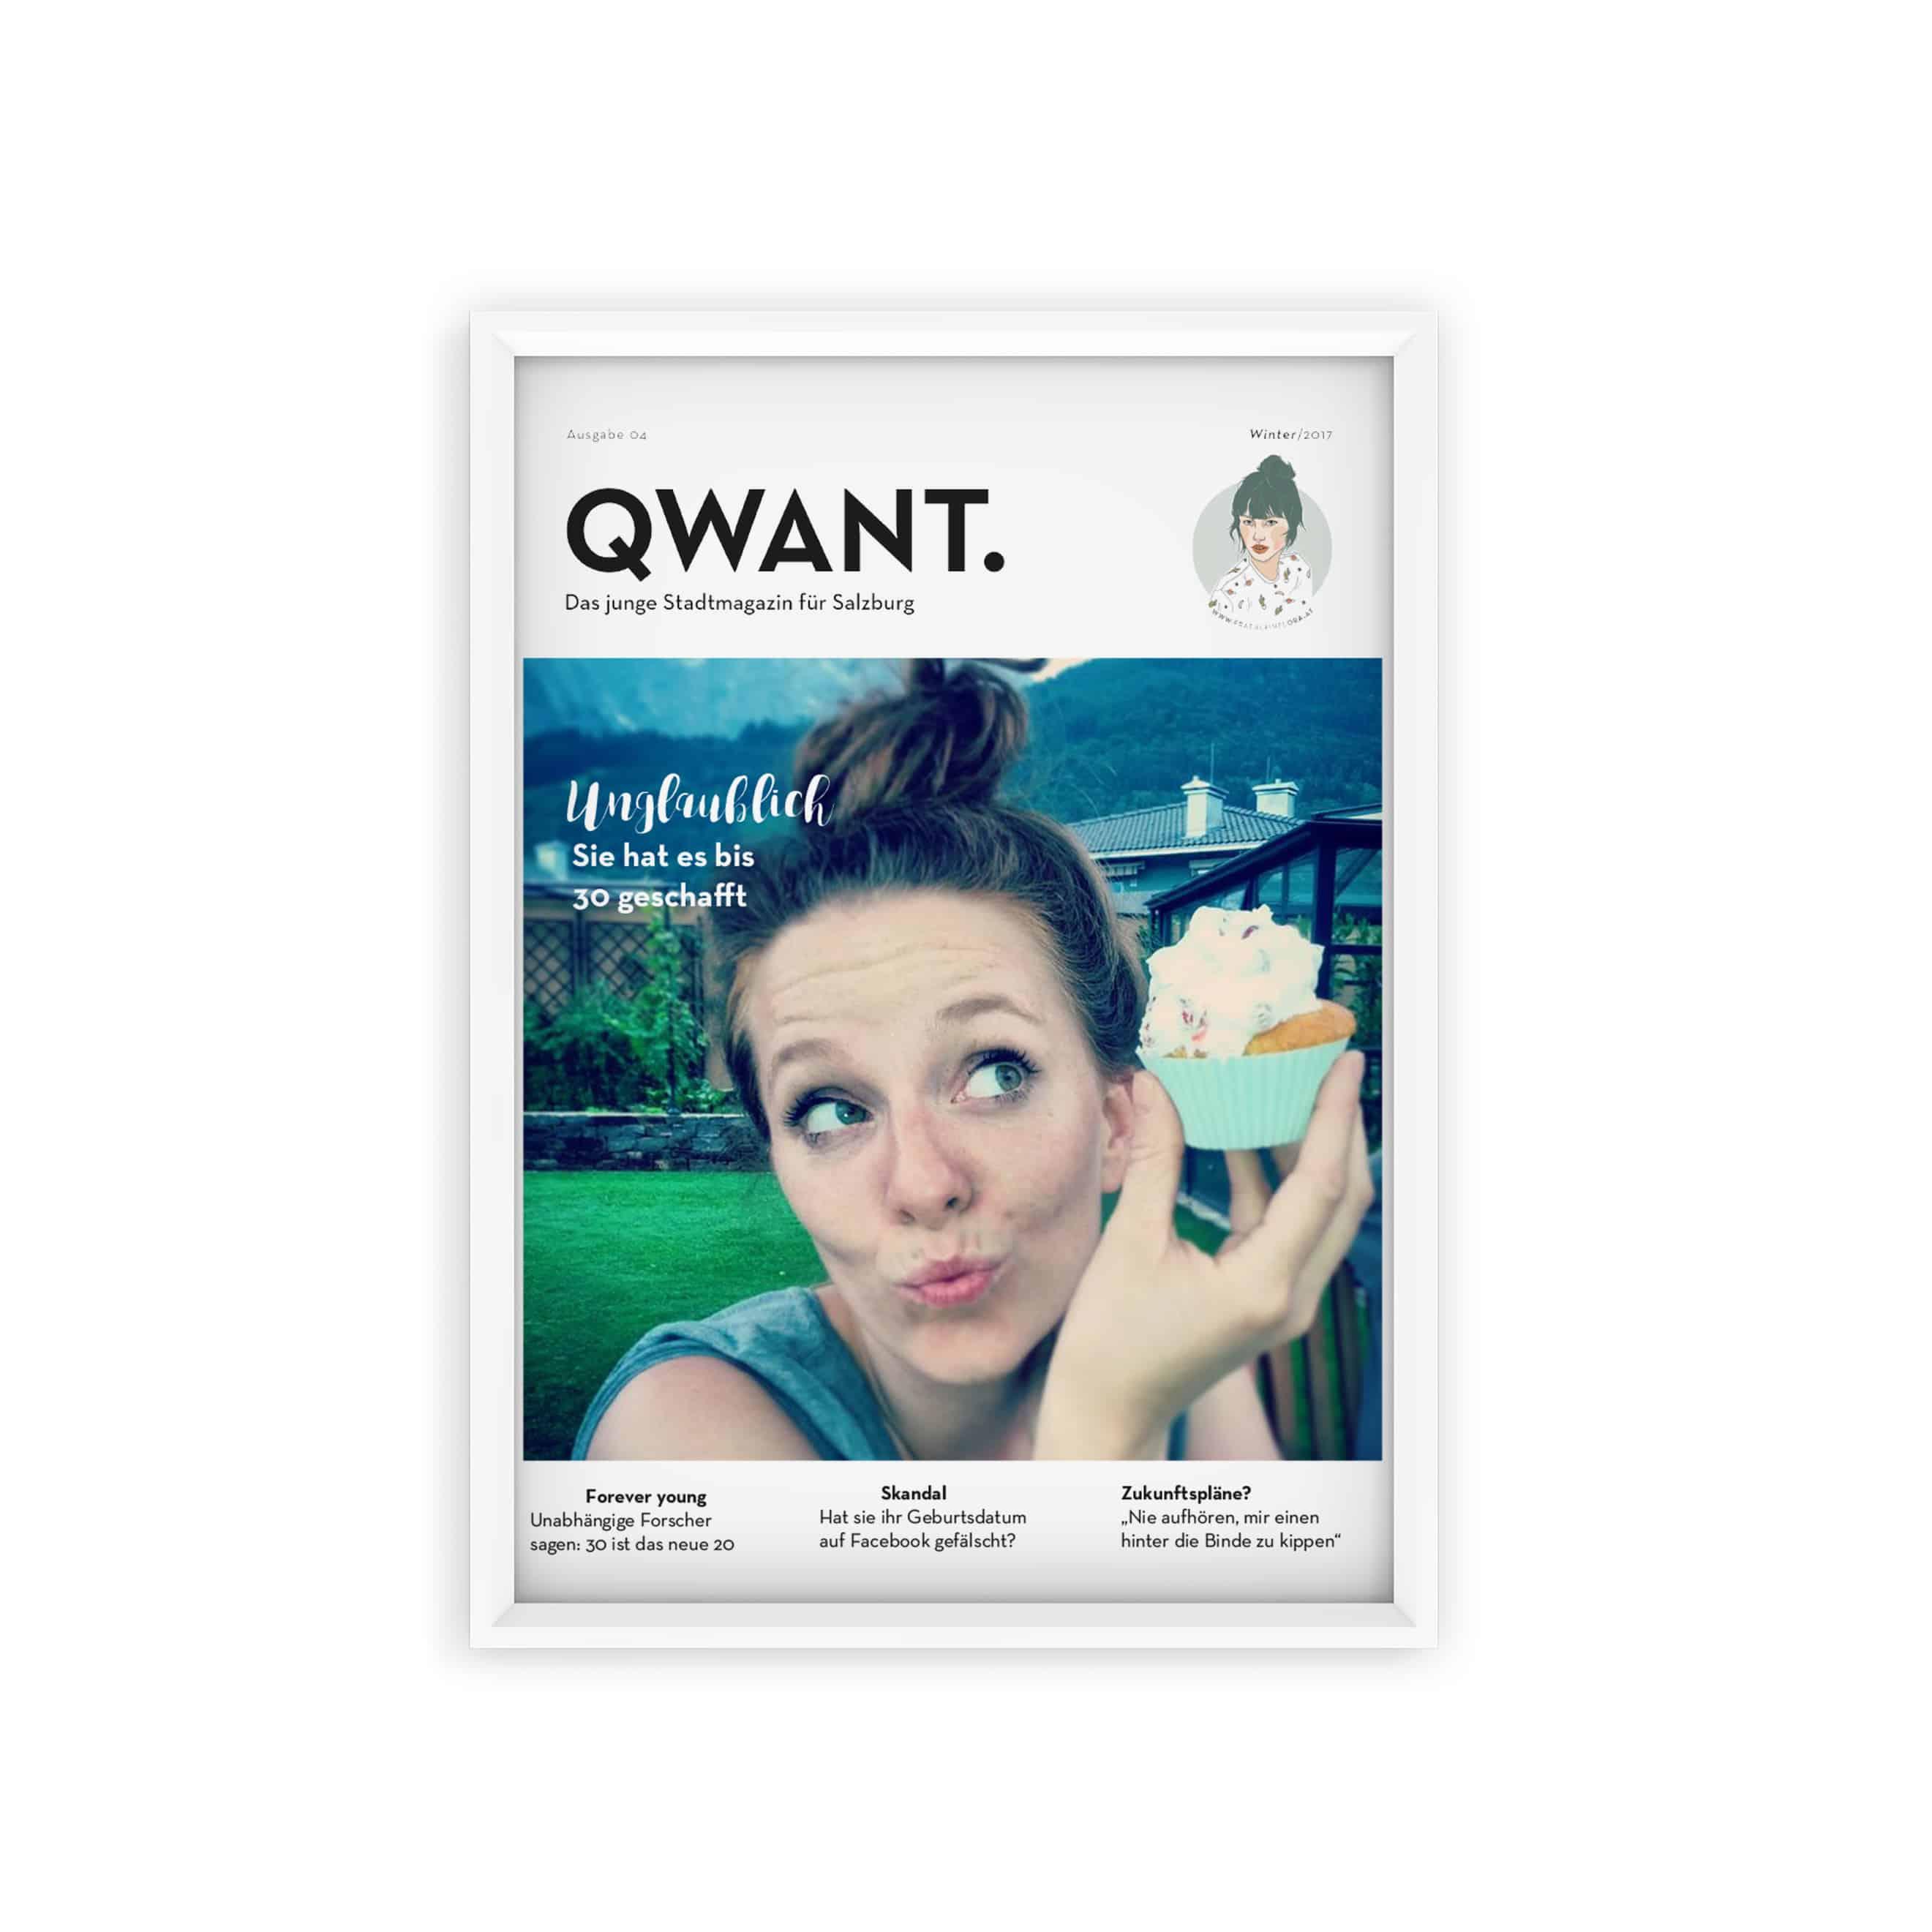 Erstelle dein eigenes QWANT. Cover